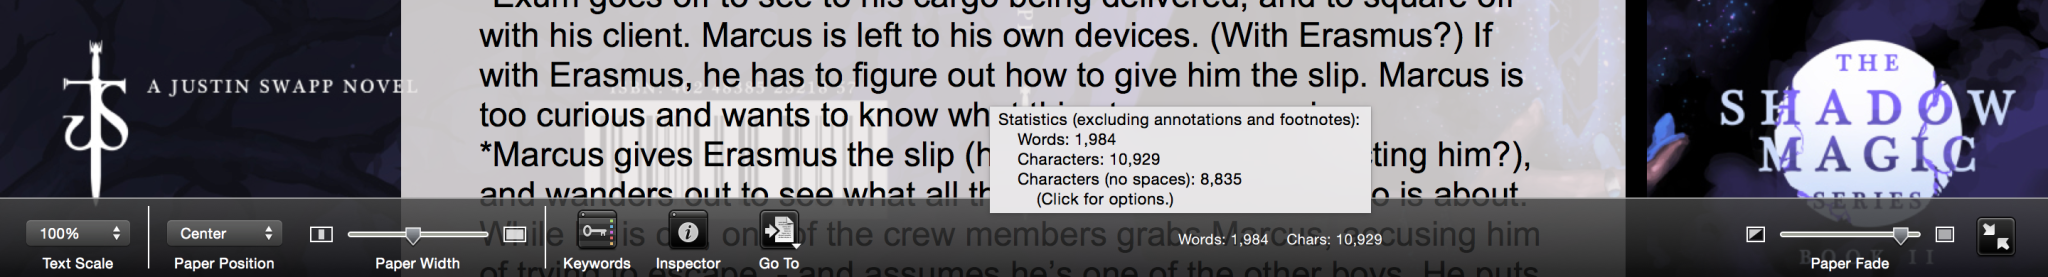 scrivener full screen bottom bump